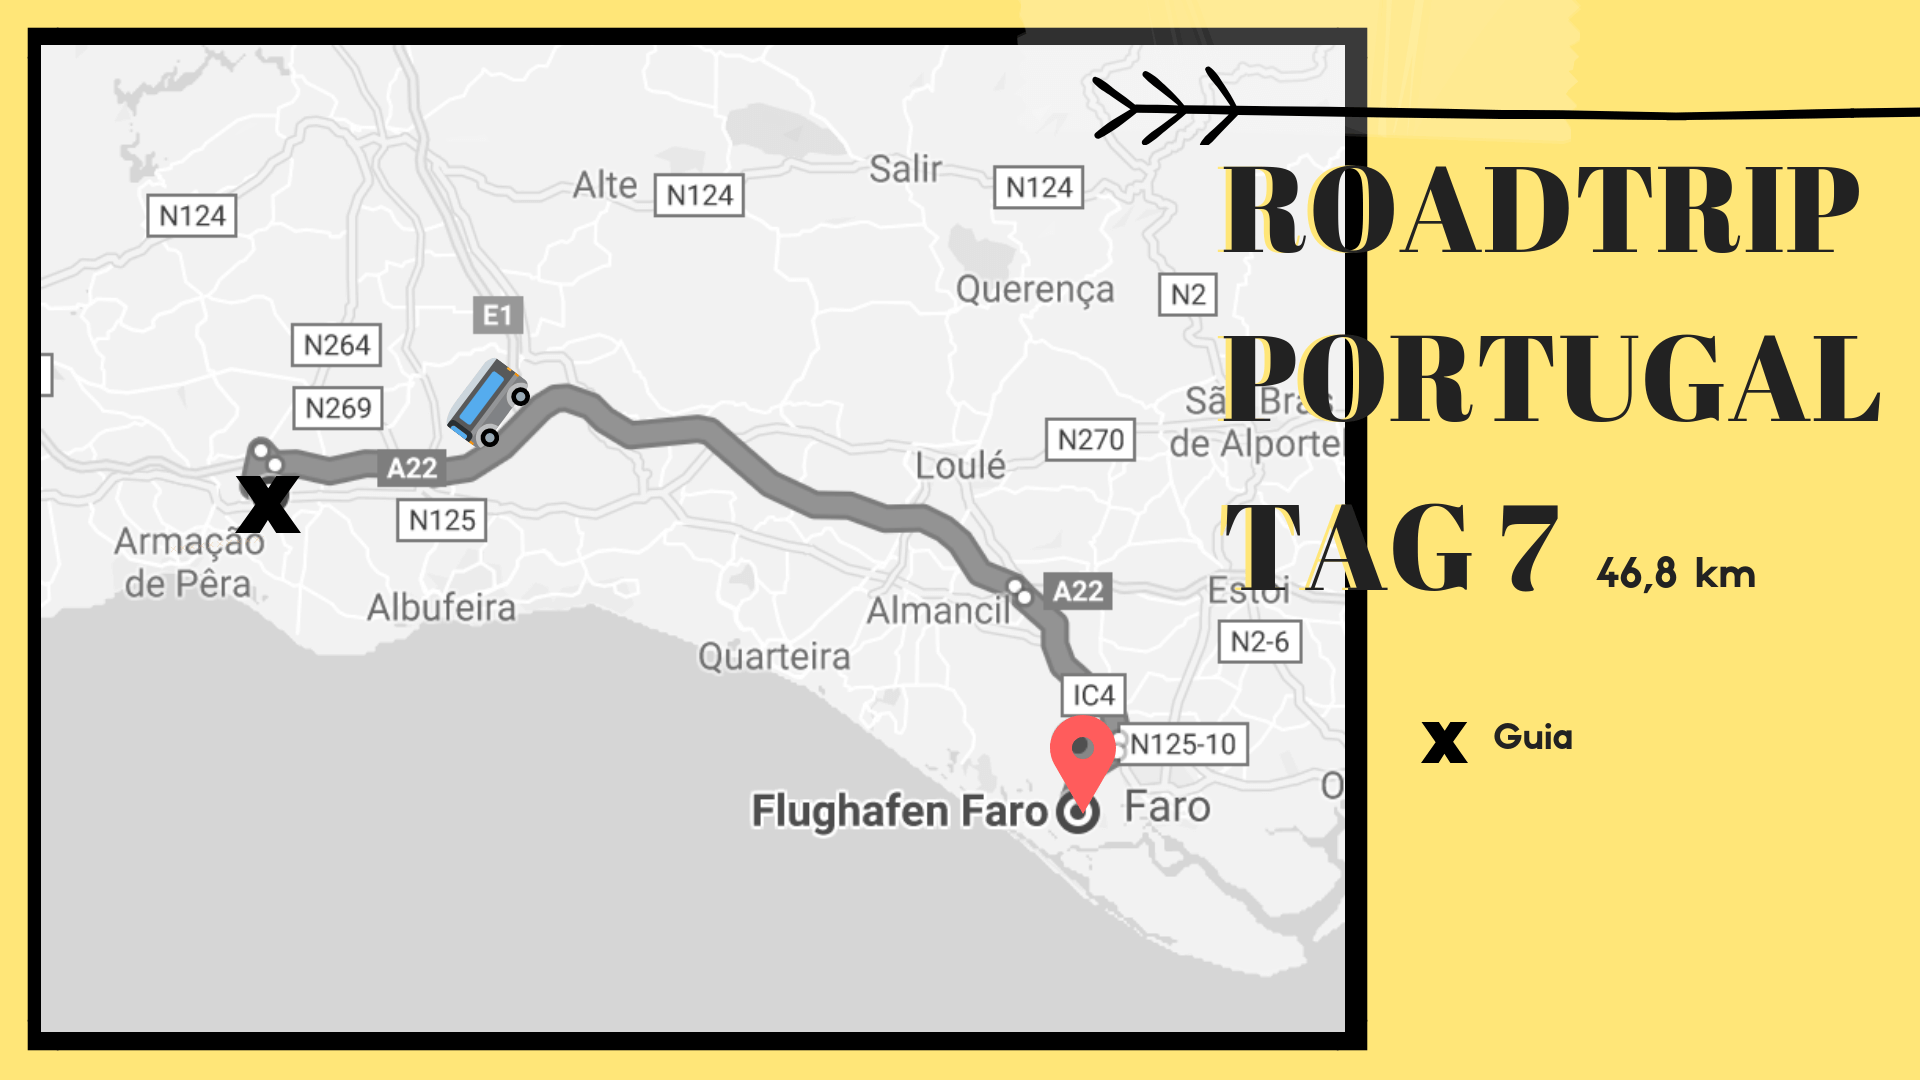 Roadtrip Portugal, Route Tag 7, 25